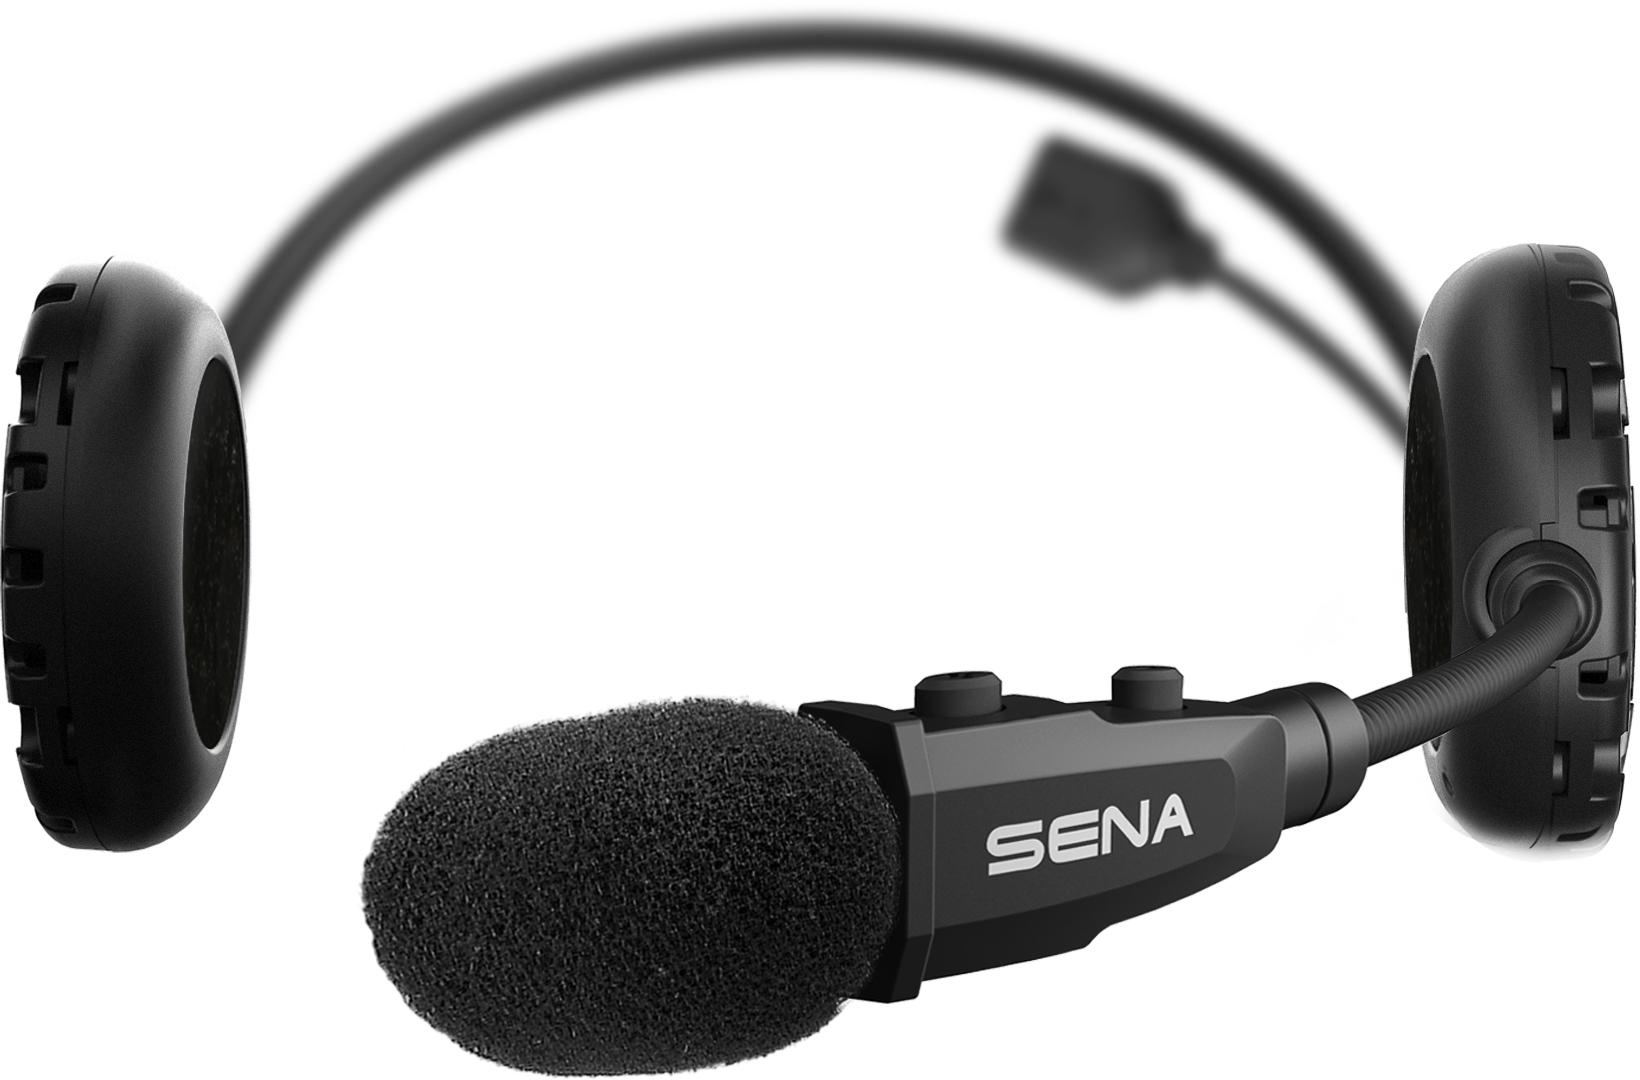 Sena 3s Plus Boom Universal microphone